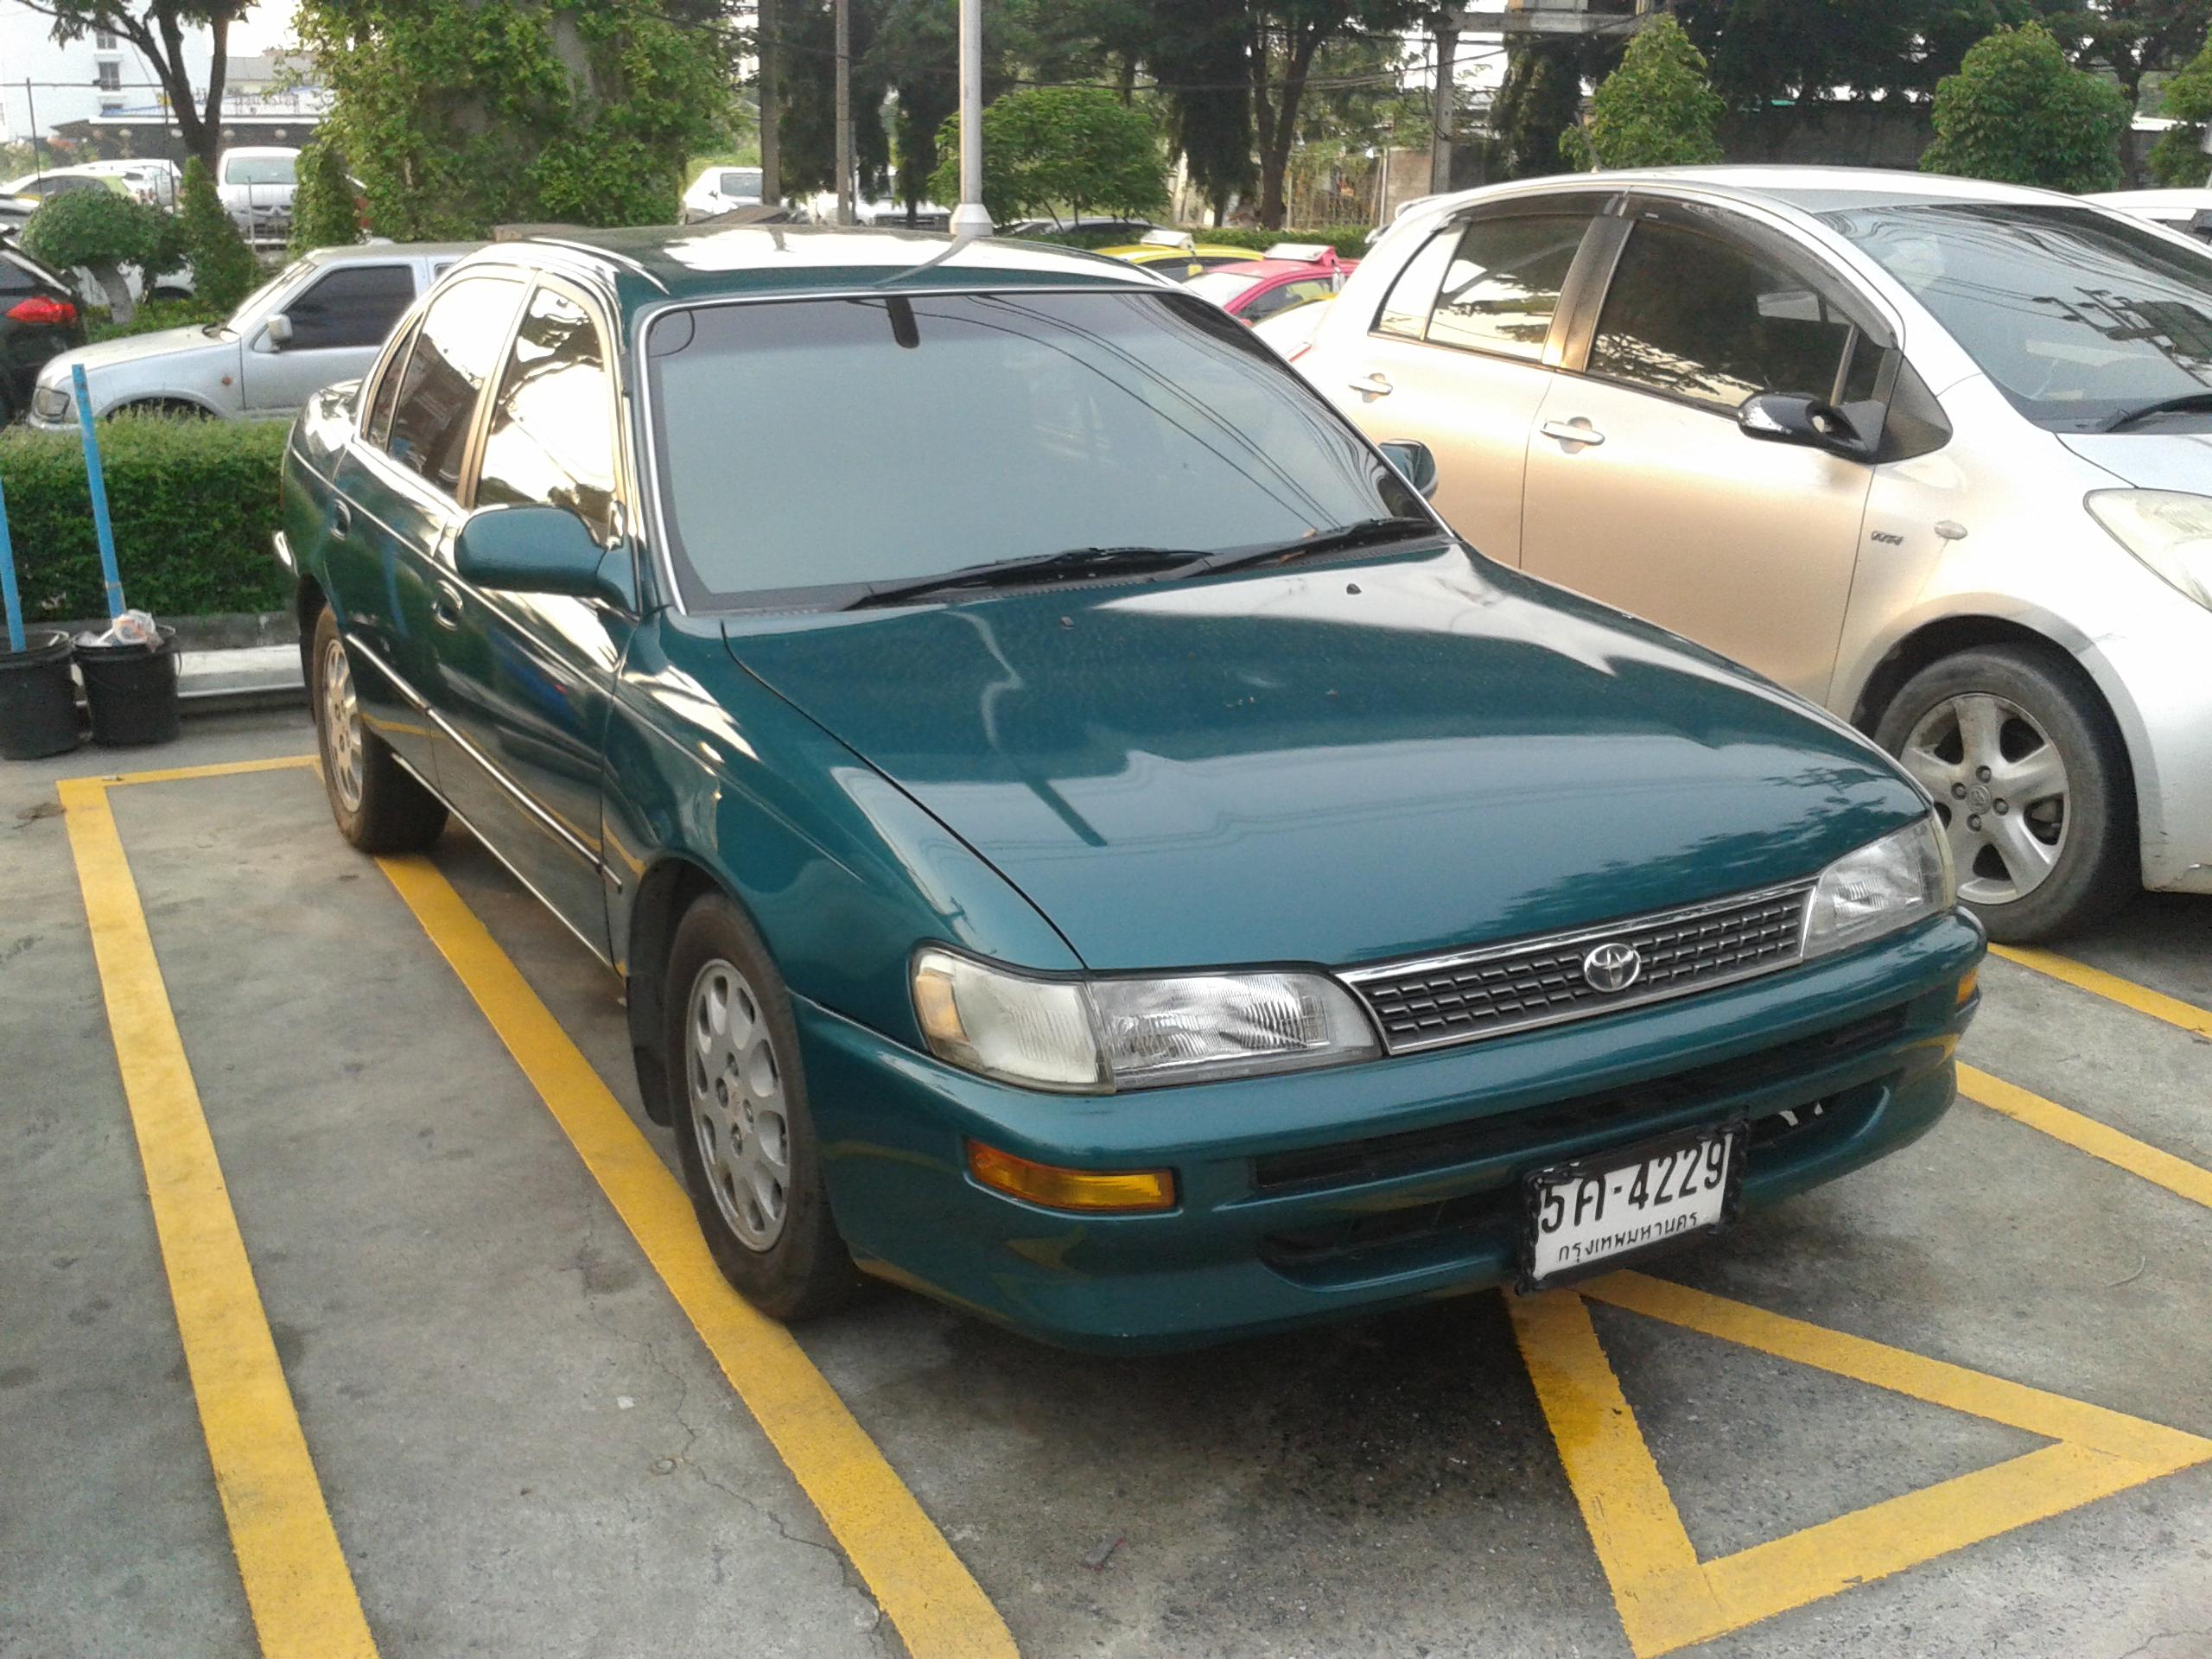 File:Toyota Corolla (E100) 02 jpg - Wikimedia Commons